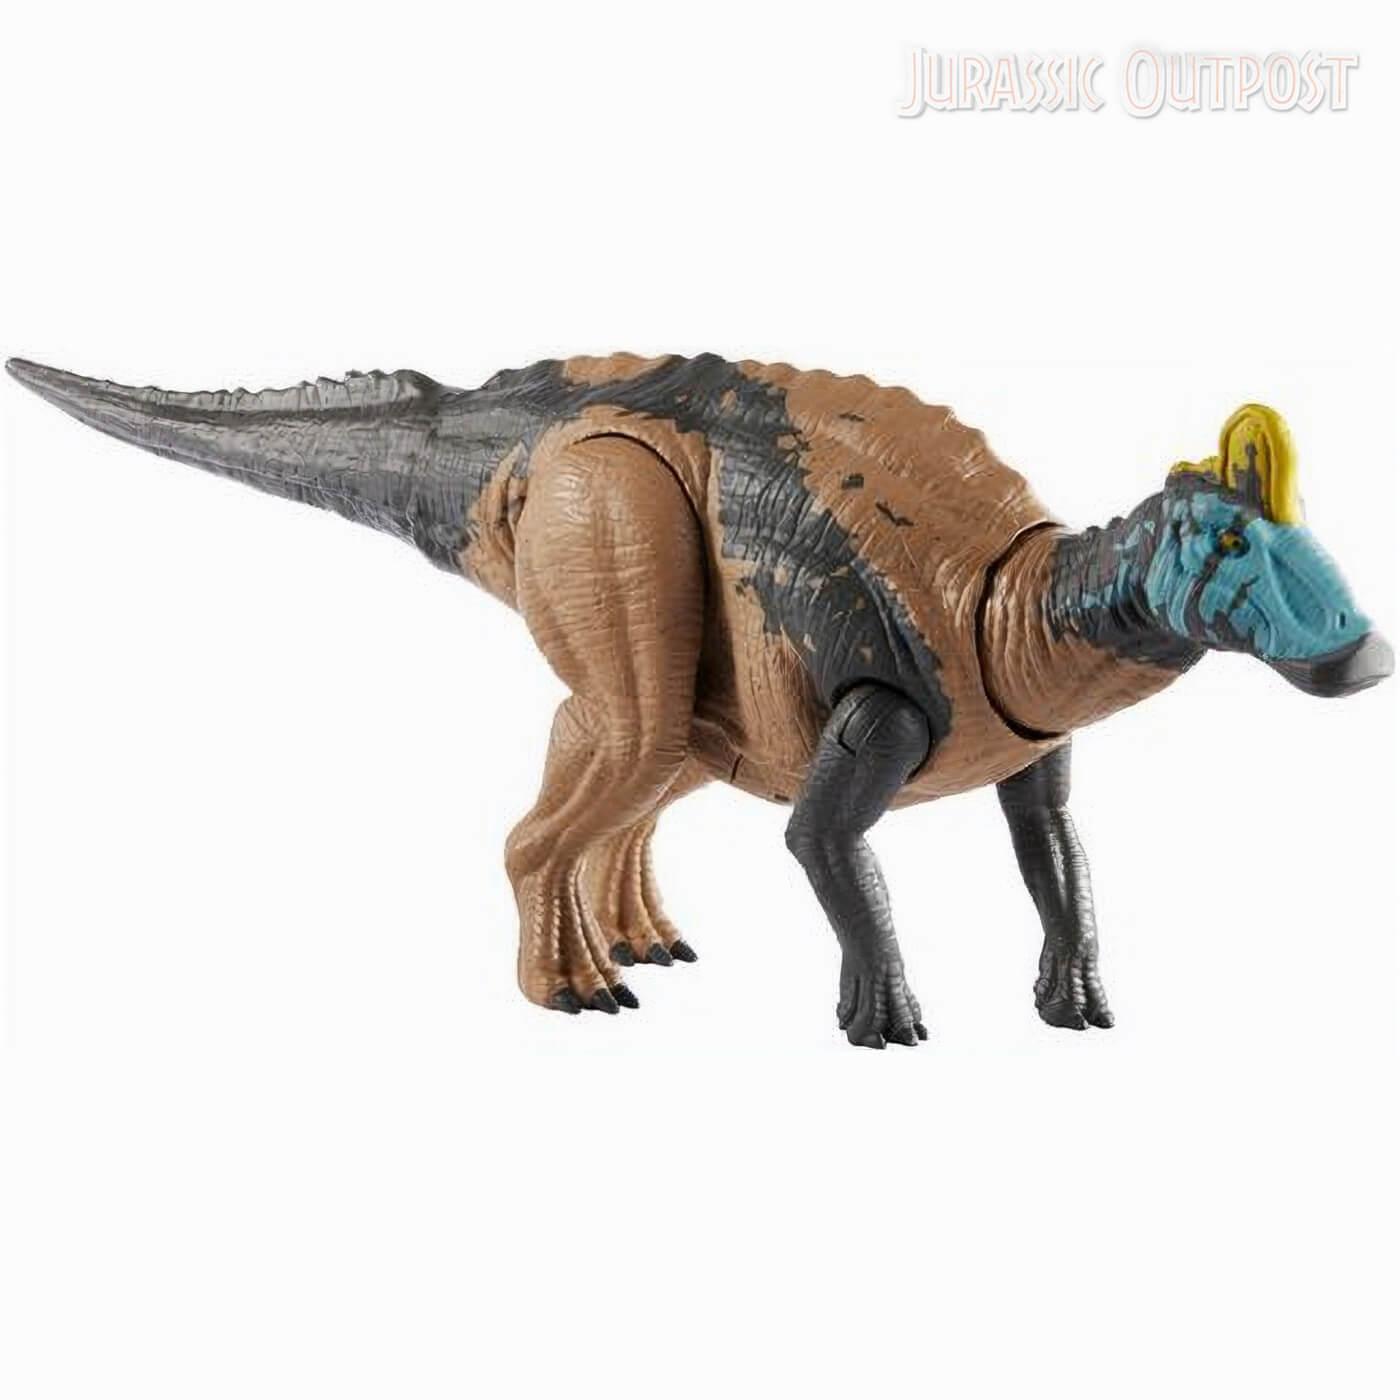 2020 Jurassic World Christmas Toys Huge Assortment of Mattel's 2020 Jurassic World Primal Attack Toys